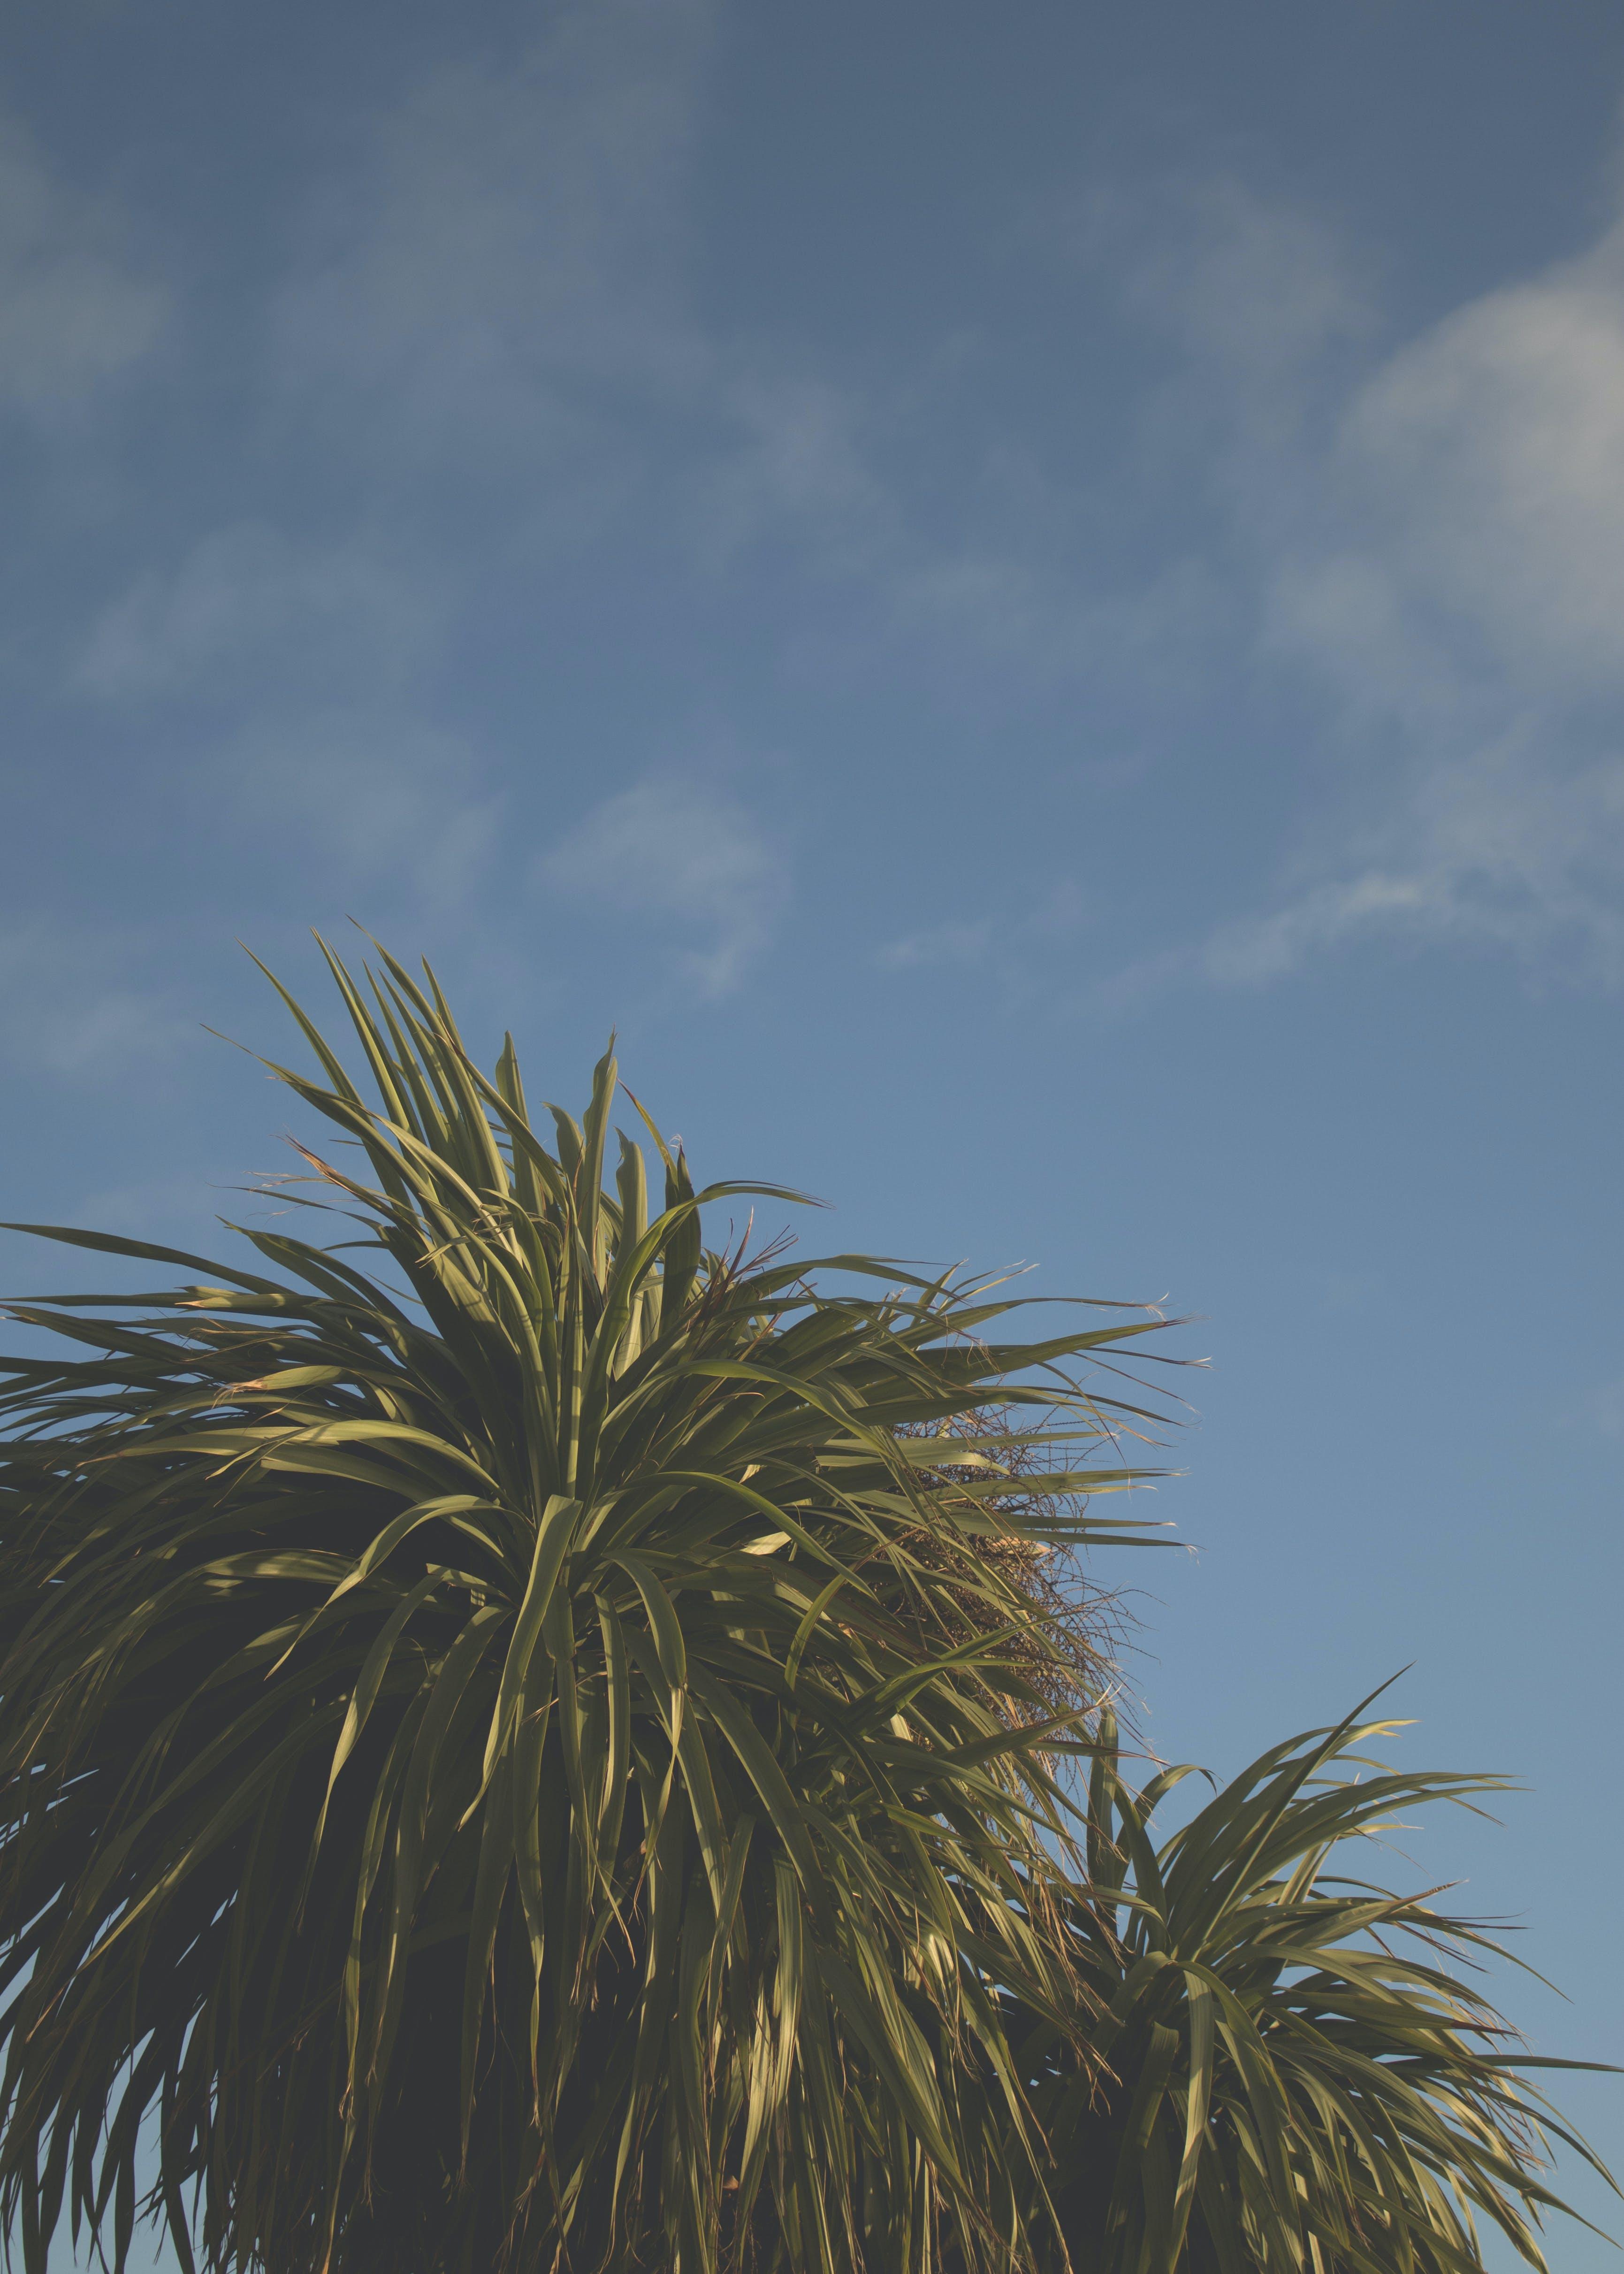 Free stock photo of blue sky, clouds, england, palms